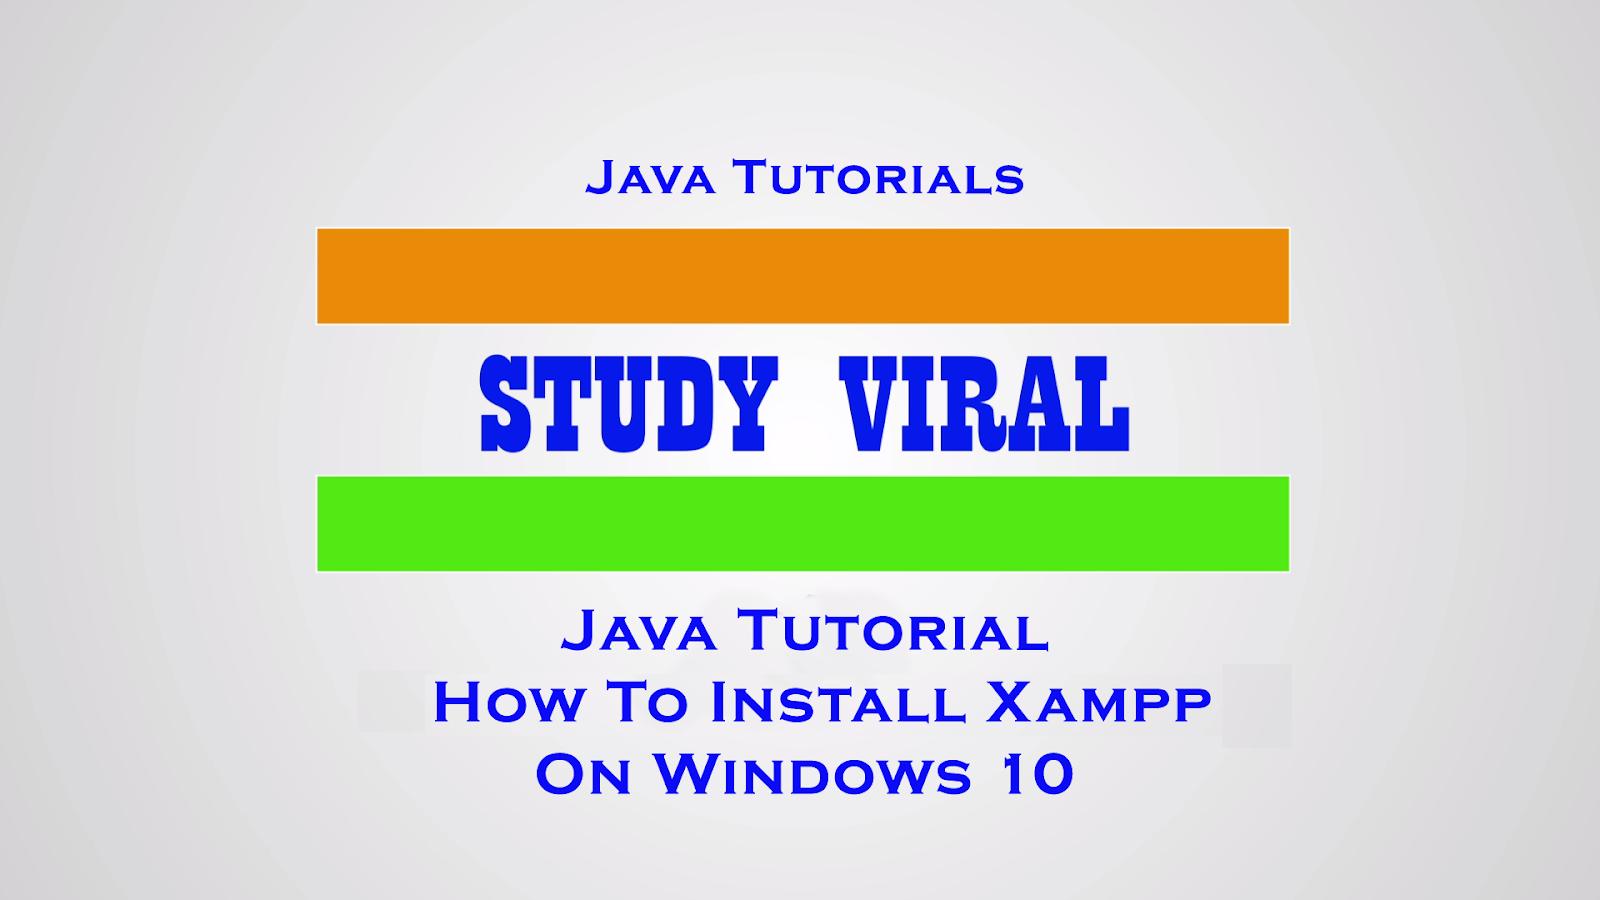 2018 study viral java tutorials for beginners step by step install xampp for java netbeans on windows 10 study viral baditri Gallery